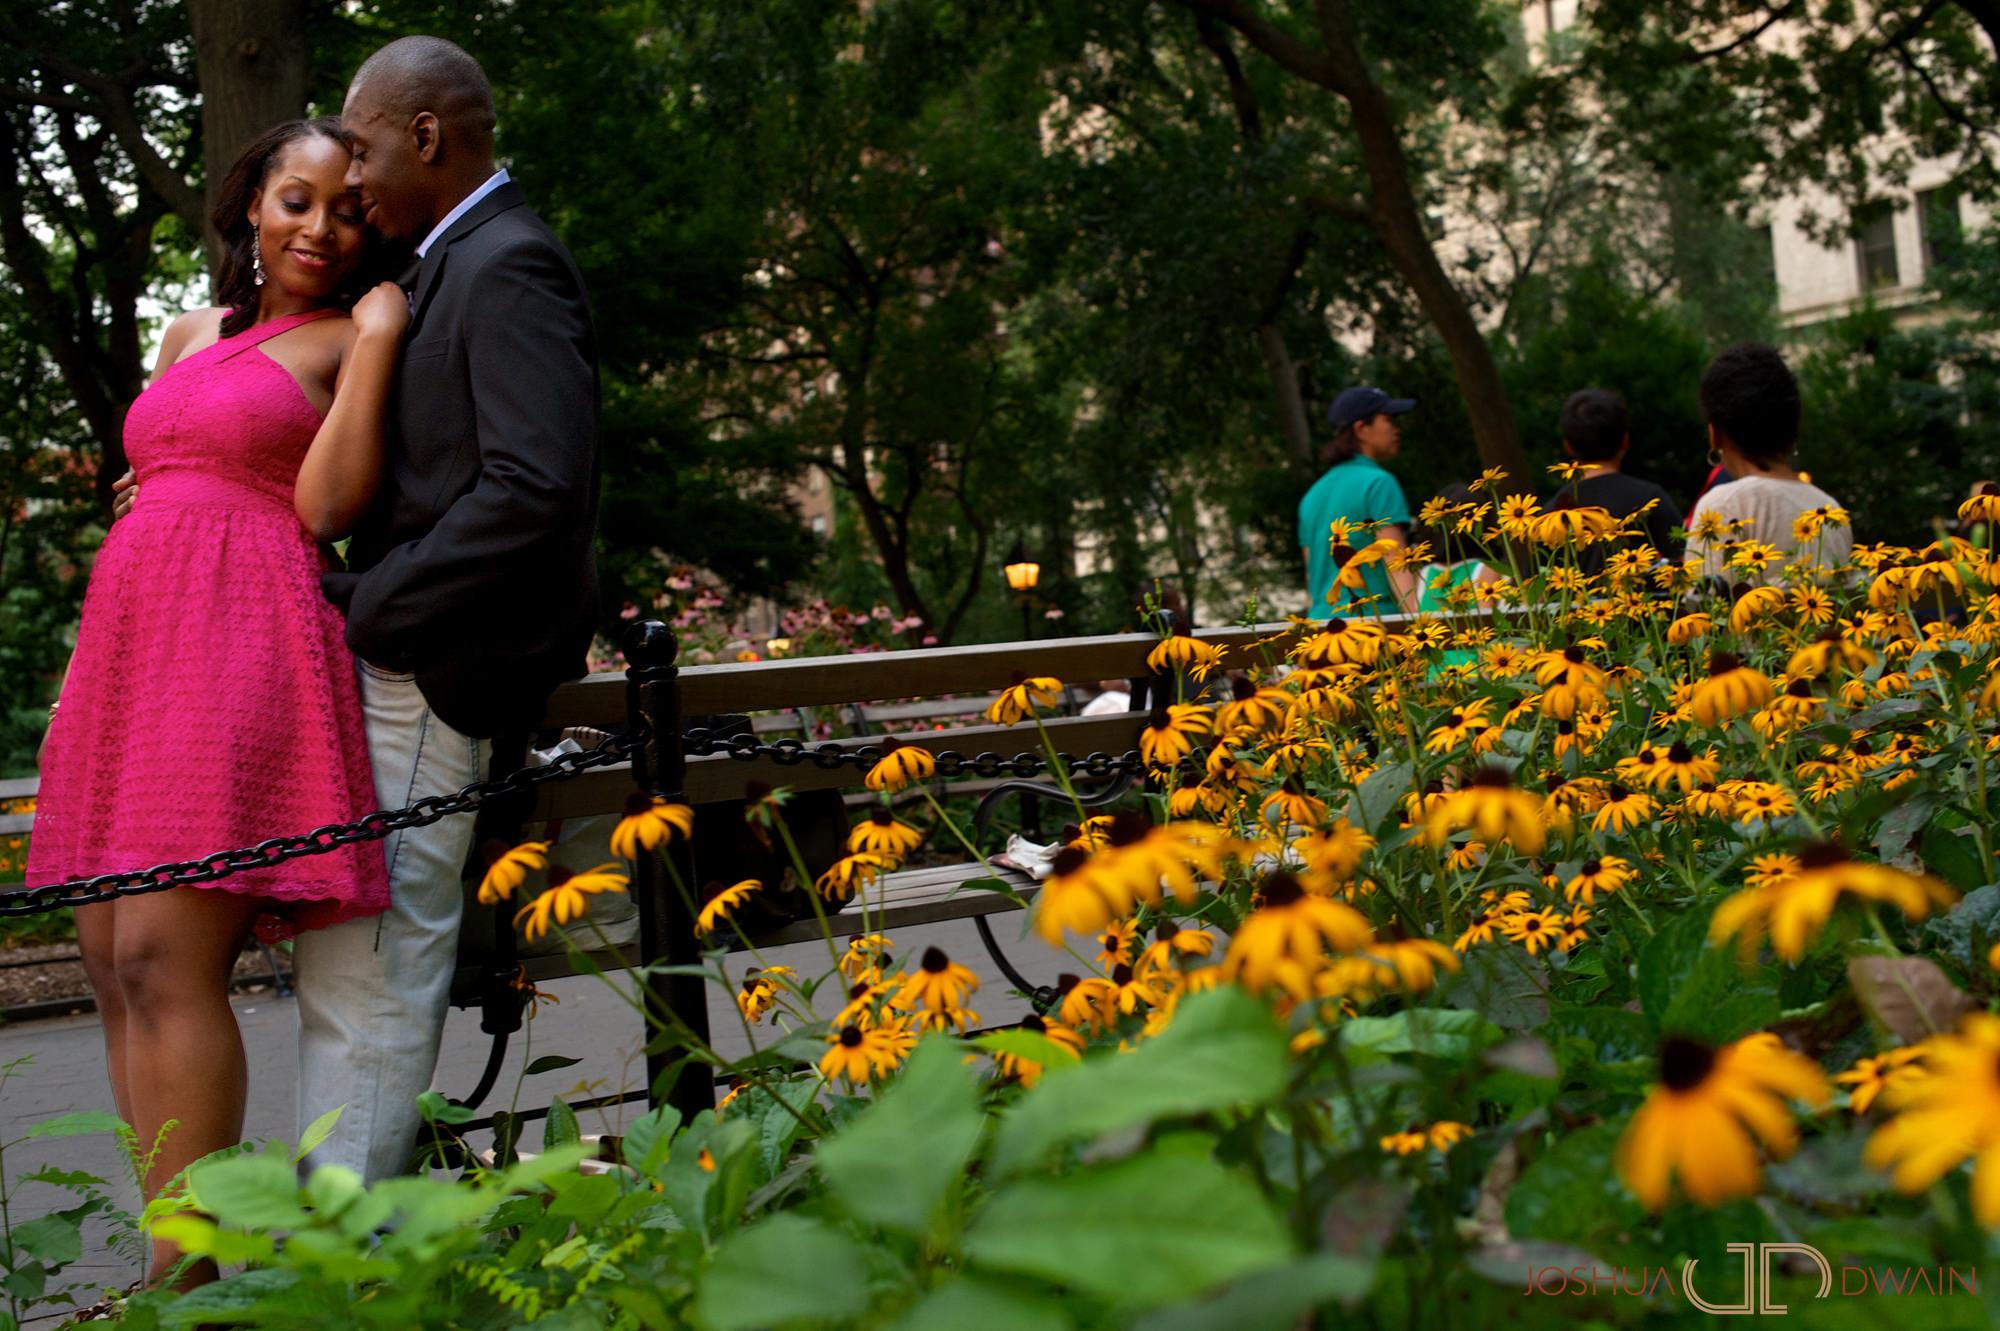 nadine-kindrick-005-lincoln-center-new-york-ny-engagement-photographer-joshua-dwain-2013-08-02_NK_035